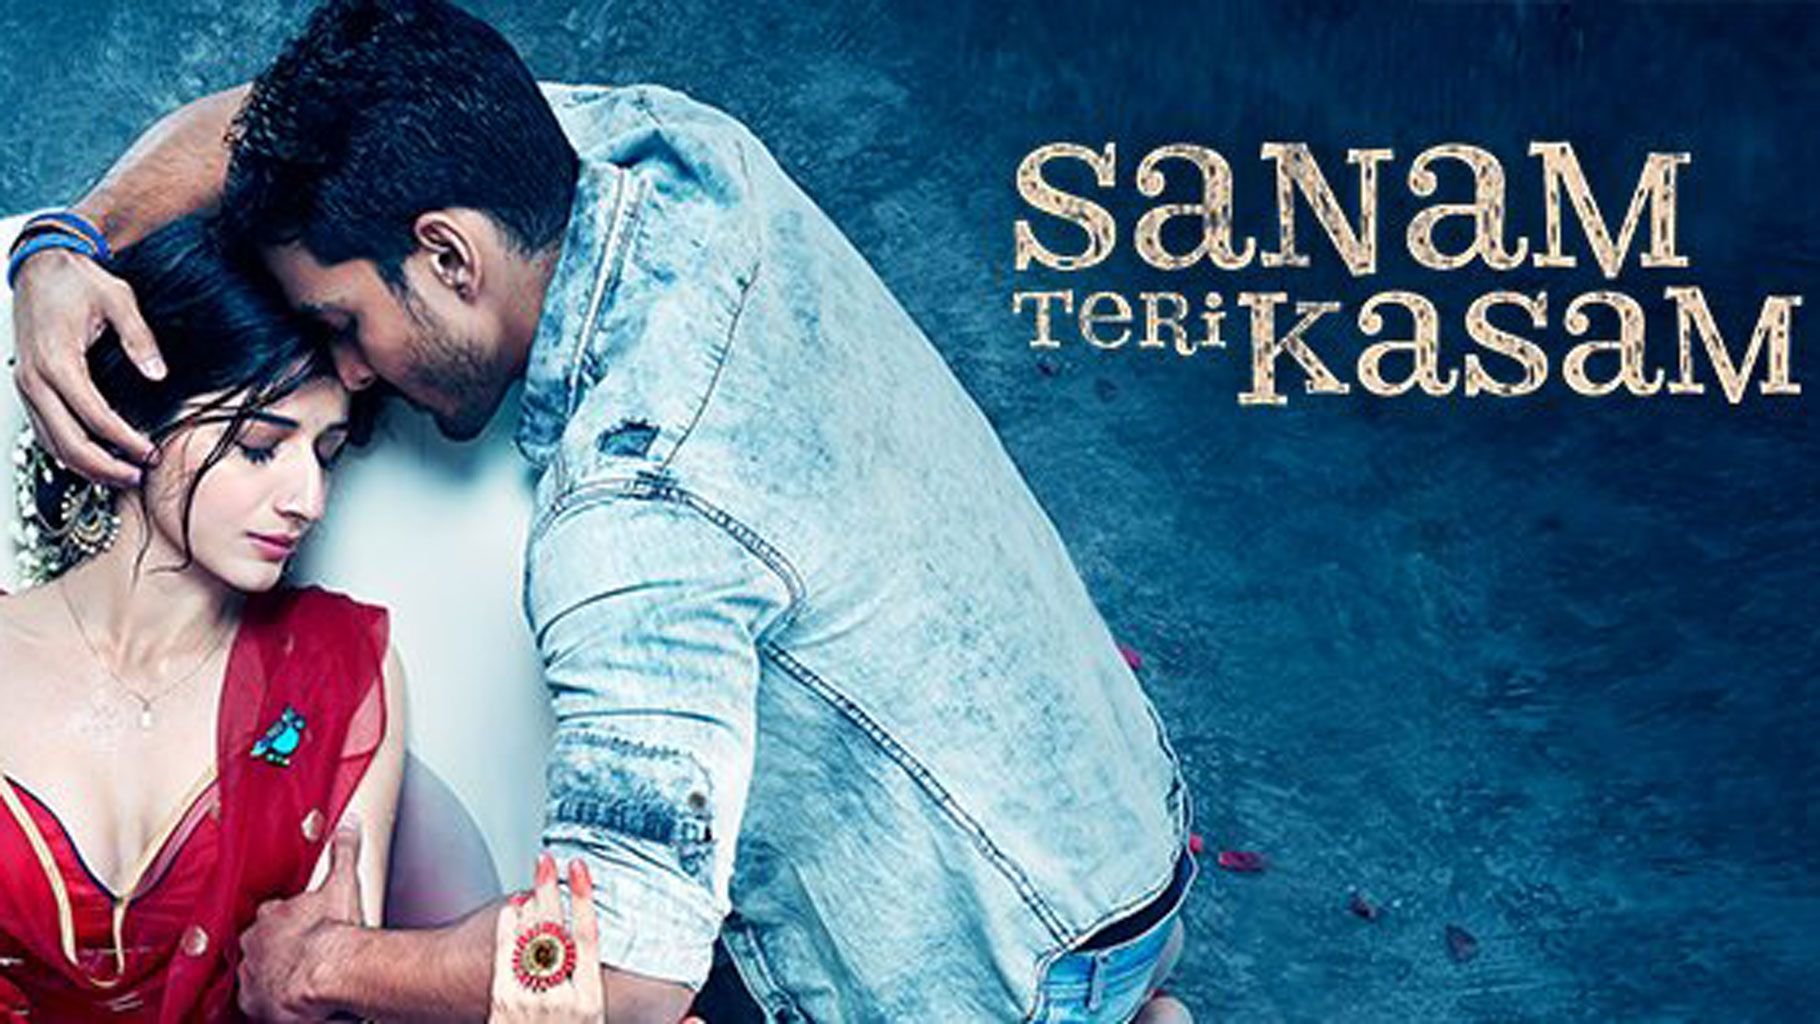 Sanam Teri Kasam Hq Movie Wallpapers Sanam Teri Kasam Hd: Sanam-teri-kasam-movie-free-download